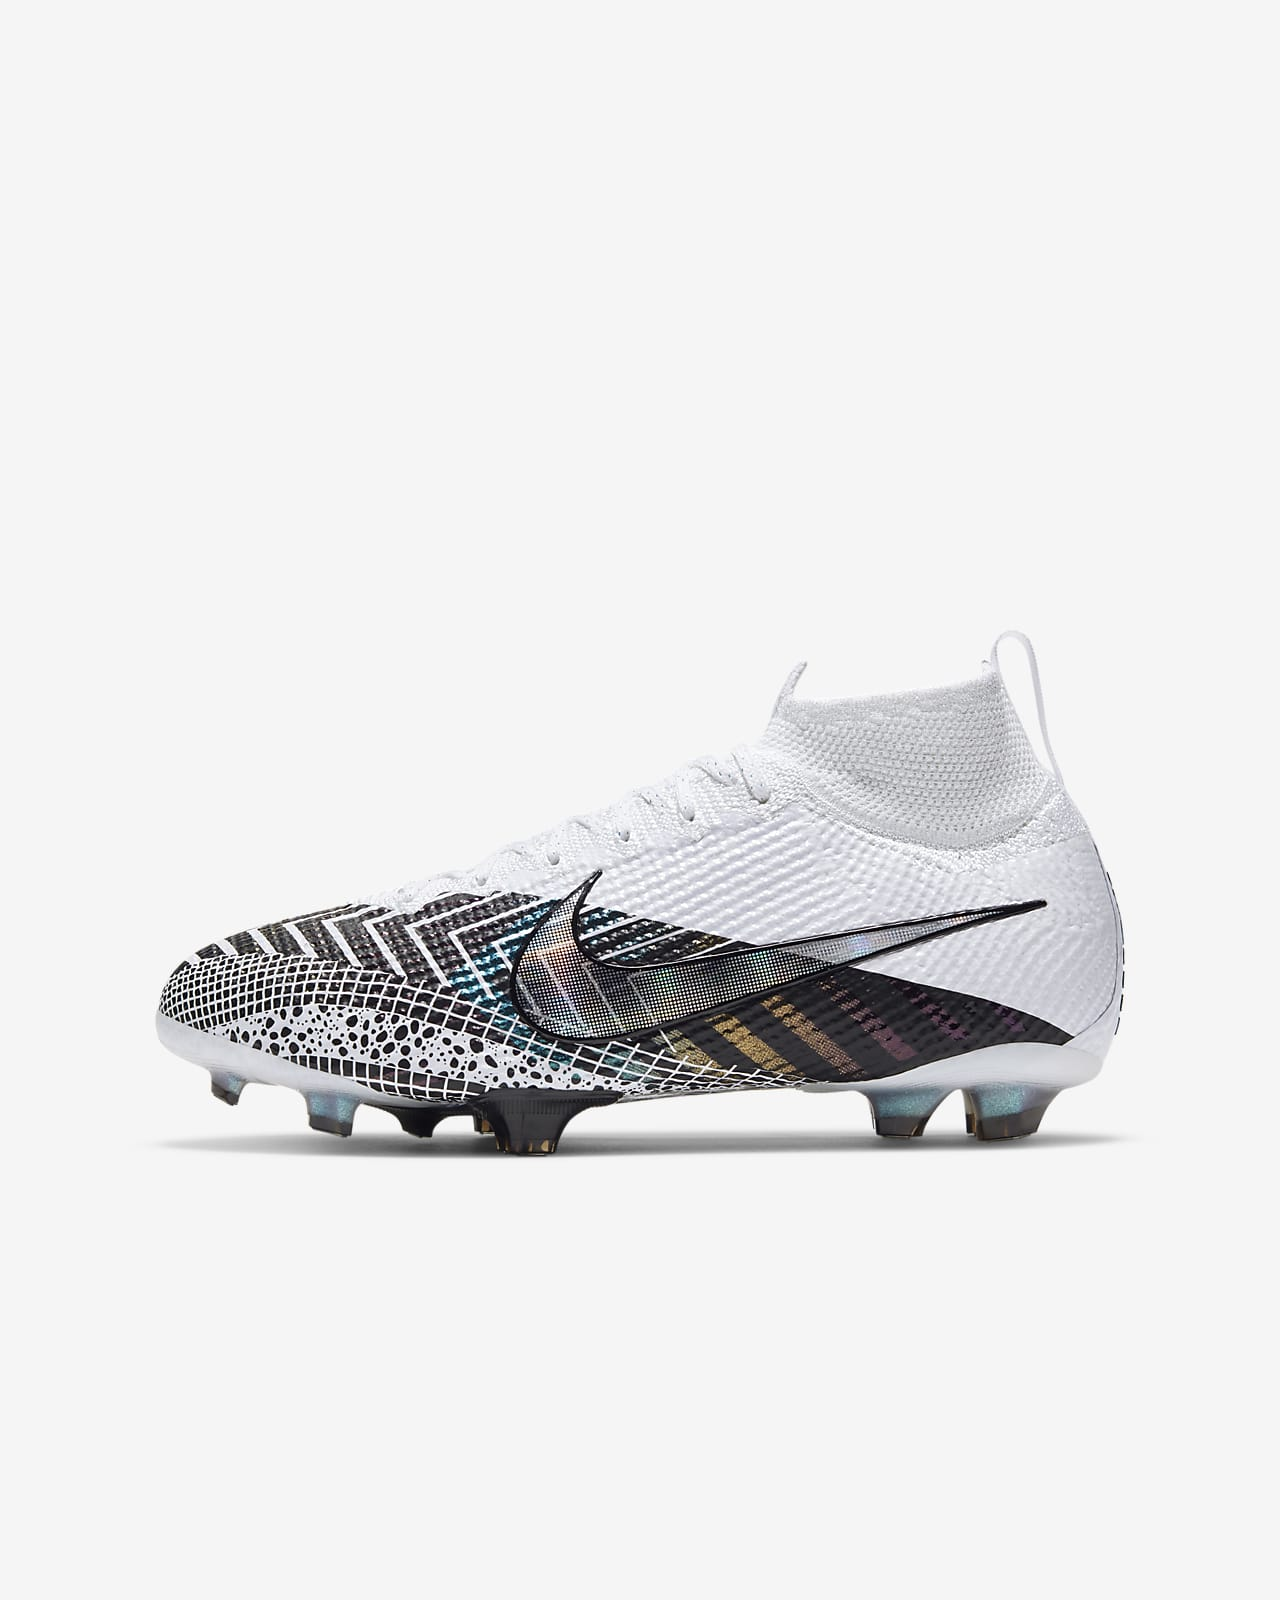 Nike Jr. Mercurial Superfly 7 Elite MDS FG Older Kids' Firm-Ground Football Boot